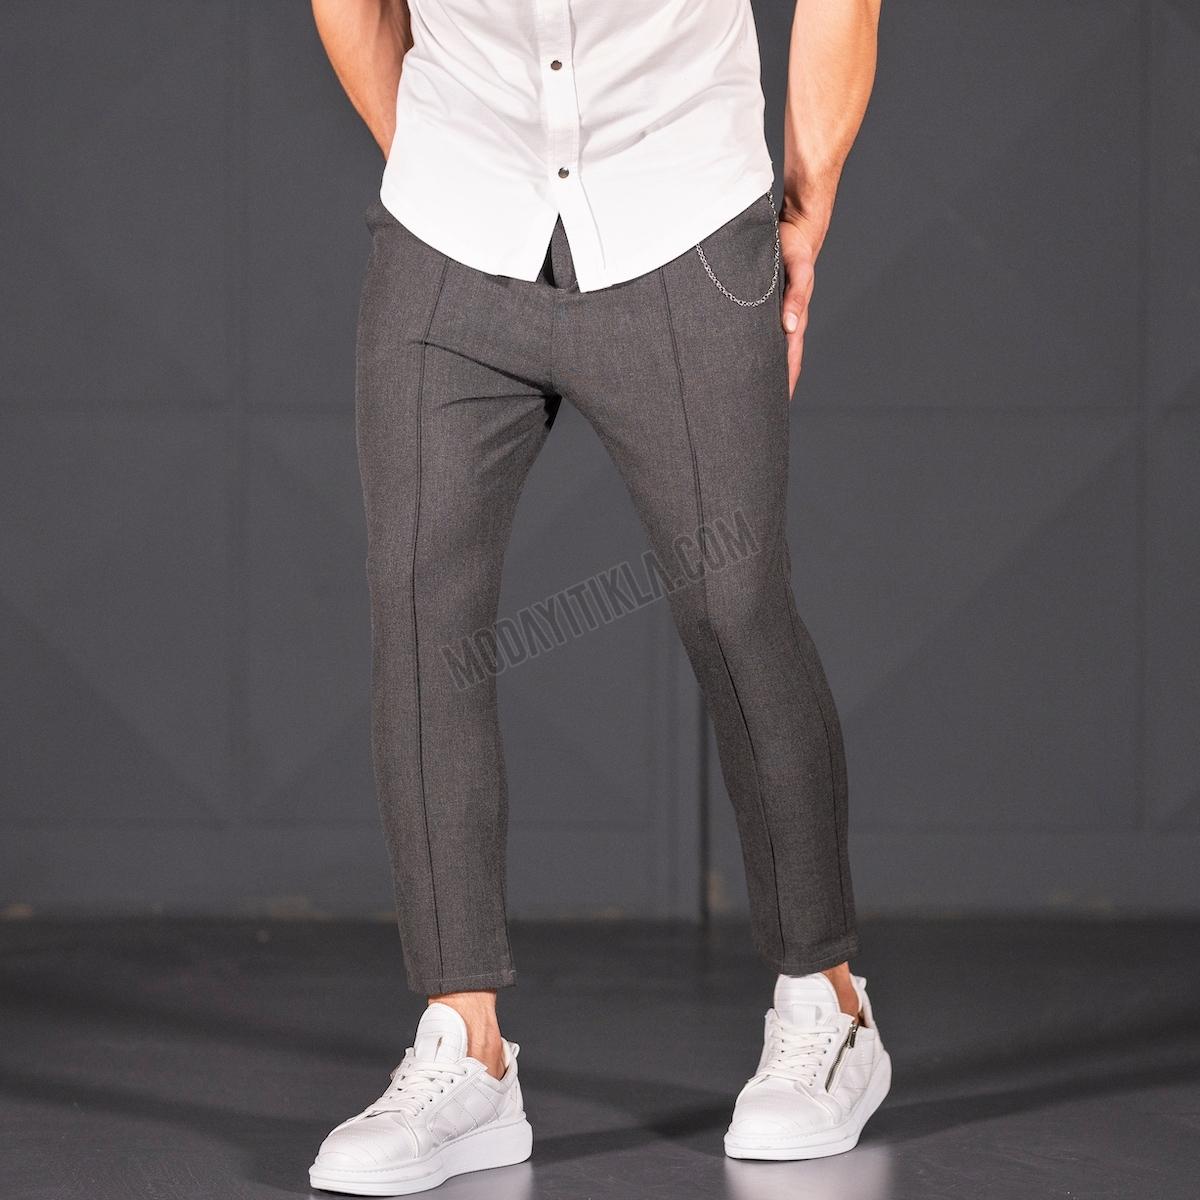 Erkek Dar Paça Fit Zincirli Çizgili Füme Kumaş Pantolon